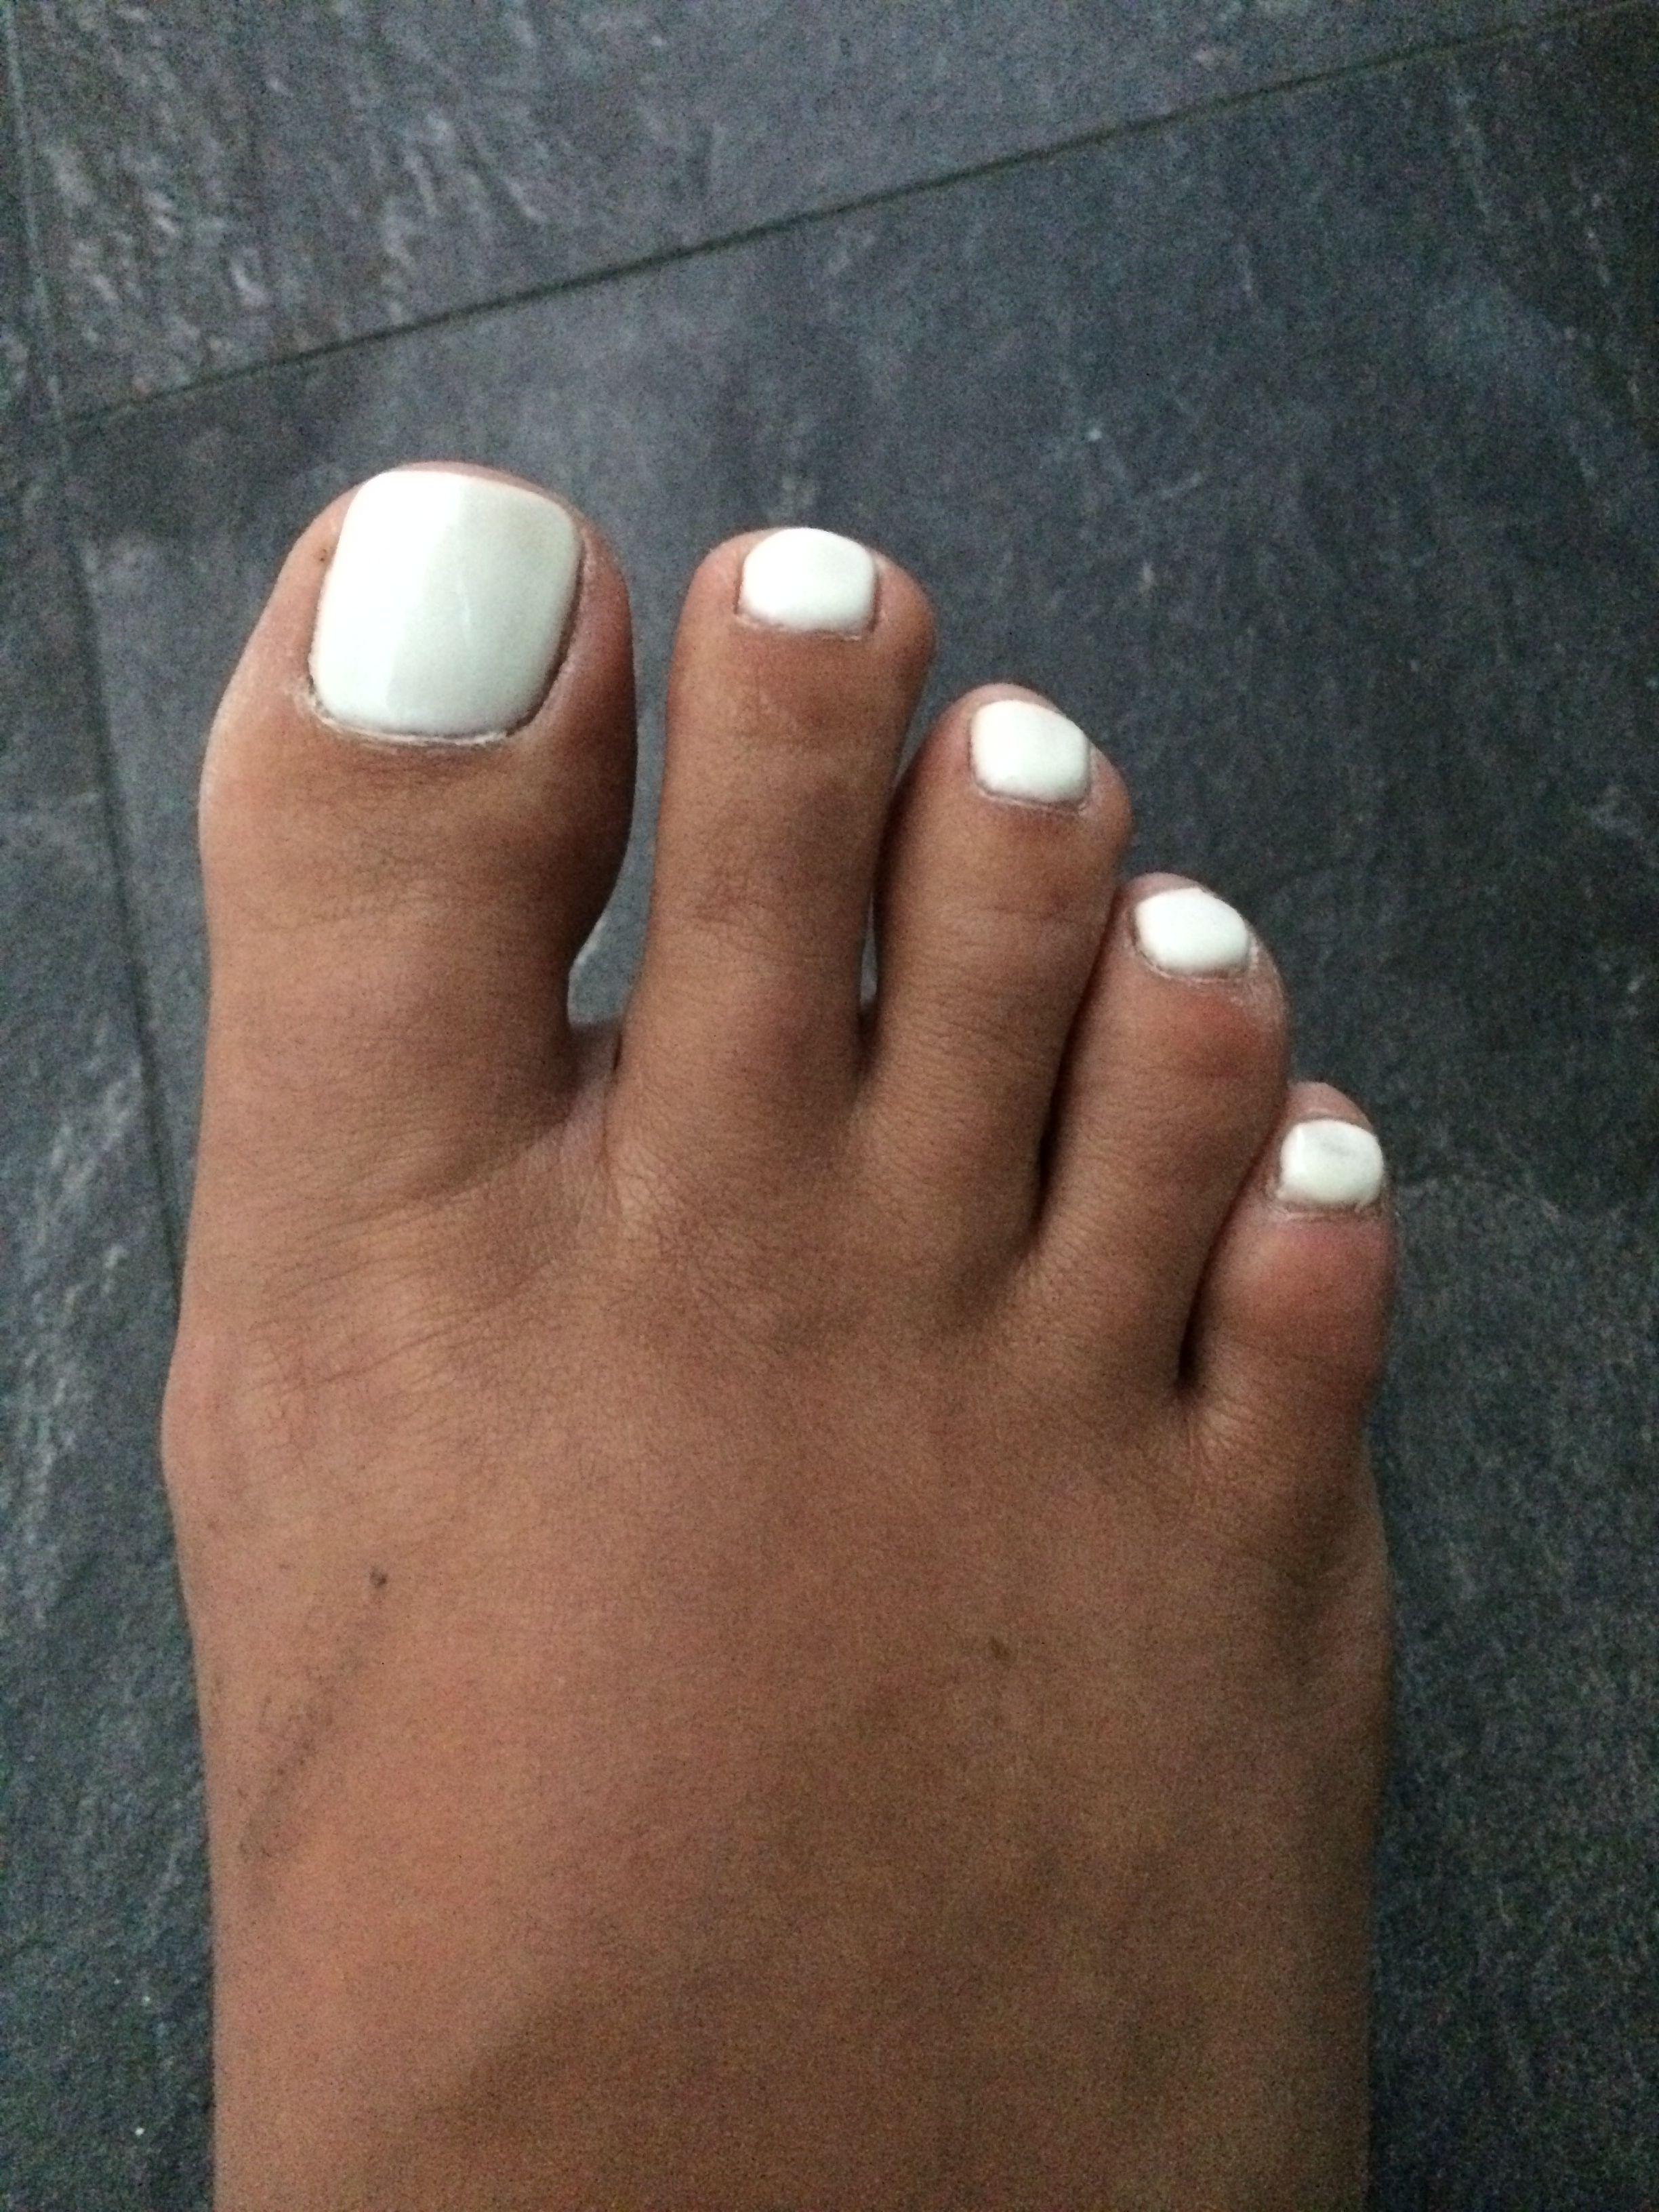 White Shellac Toes White Shellac Nails Plain White Nails White Shellac Nails Shellac Nails Shellac Toes